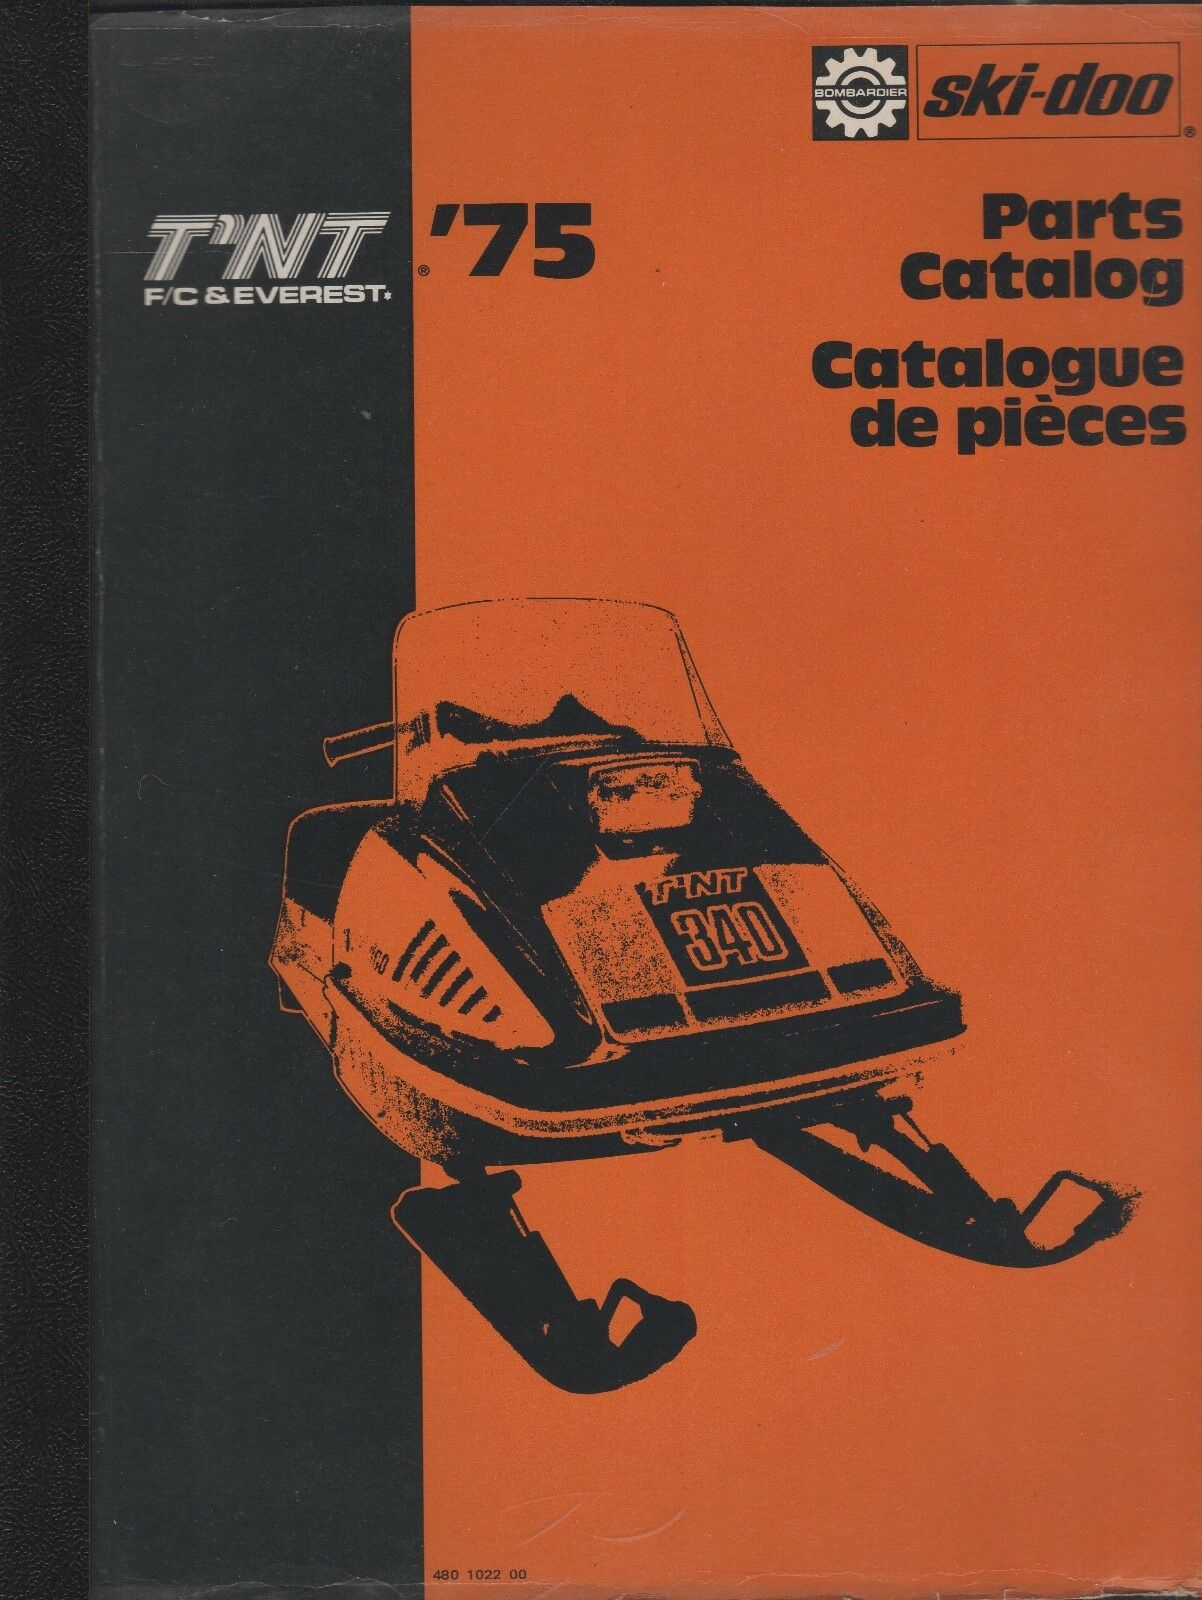 1975 SKI-DOO T'NT F A 245 RV SNOWMOBILE PARTS MANUAL 480 1027 00 (586)